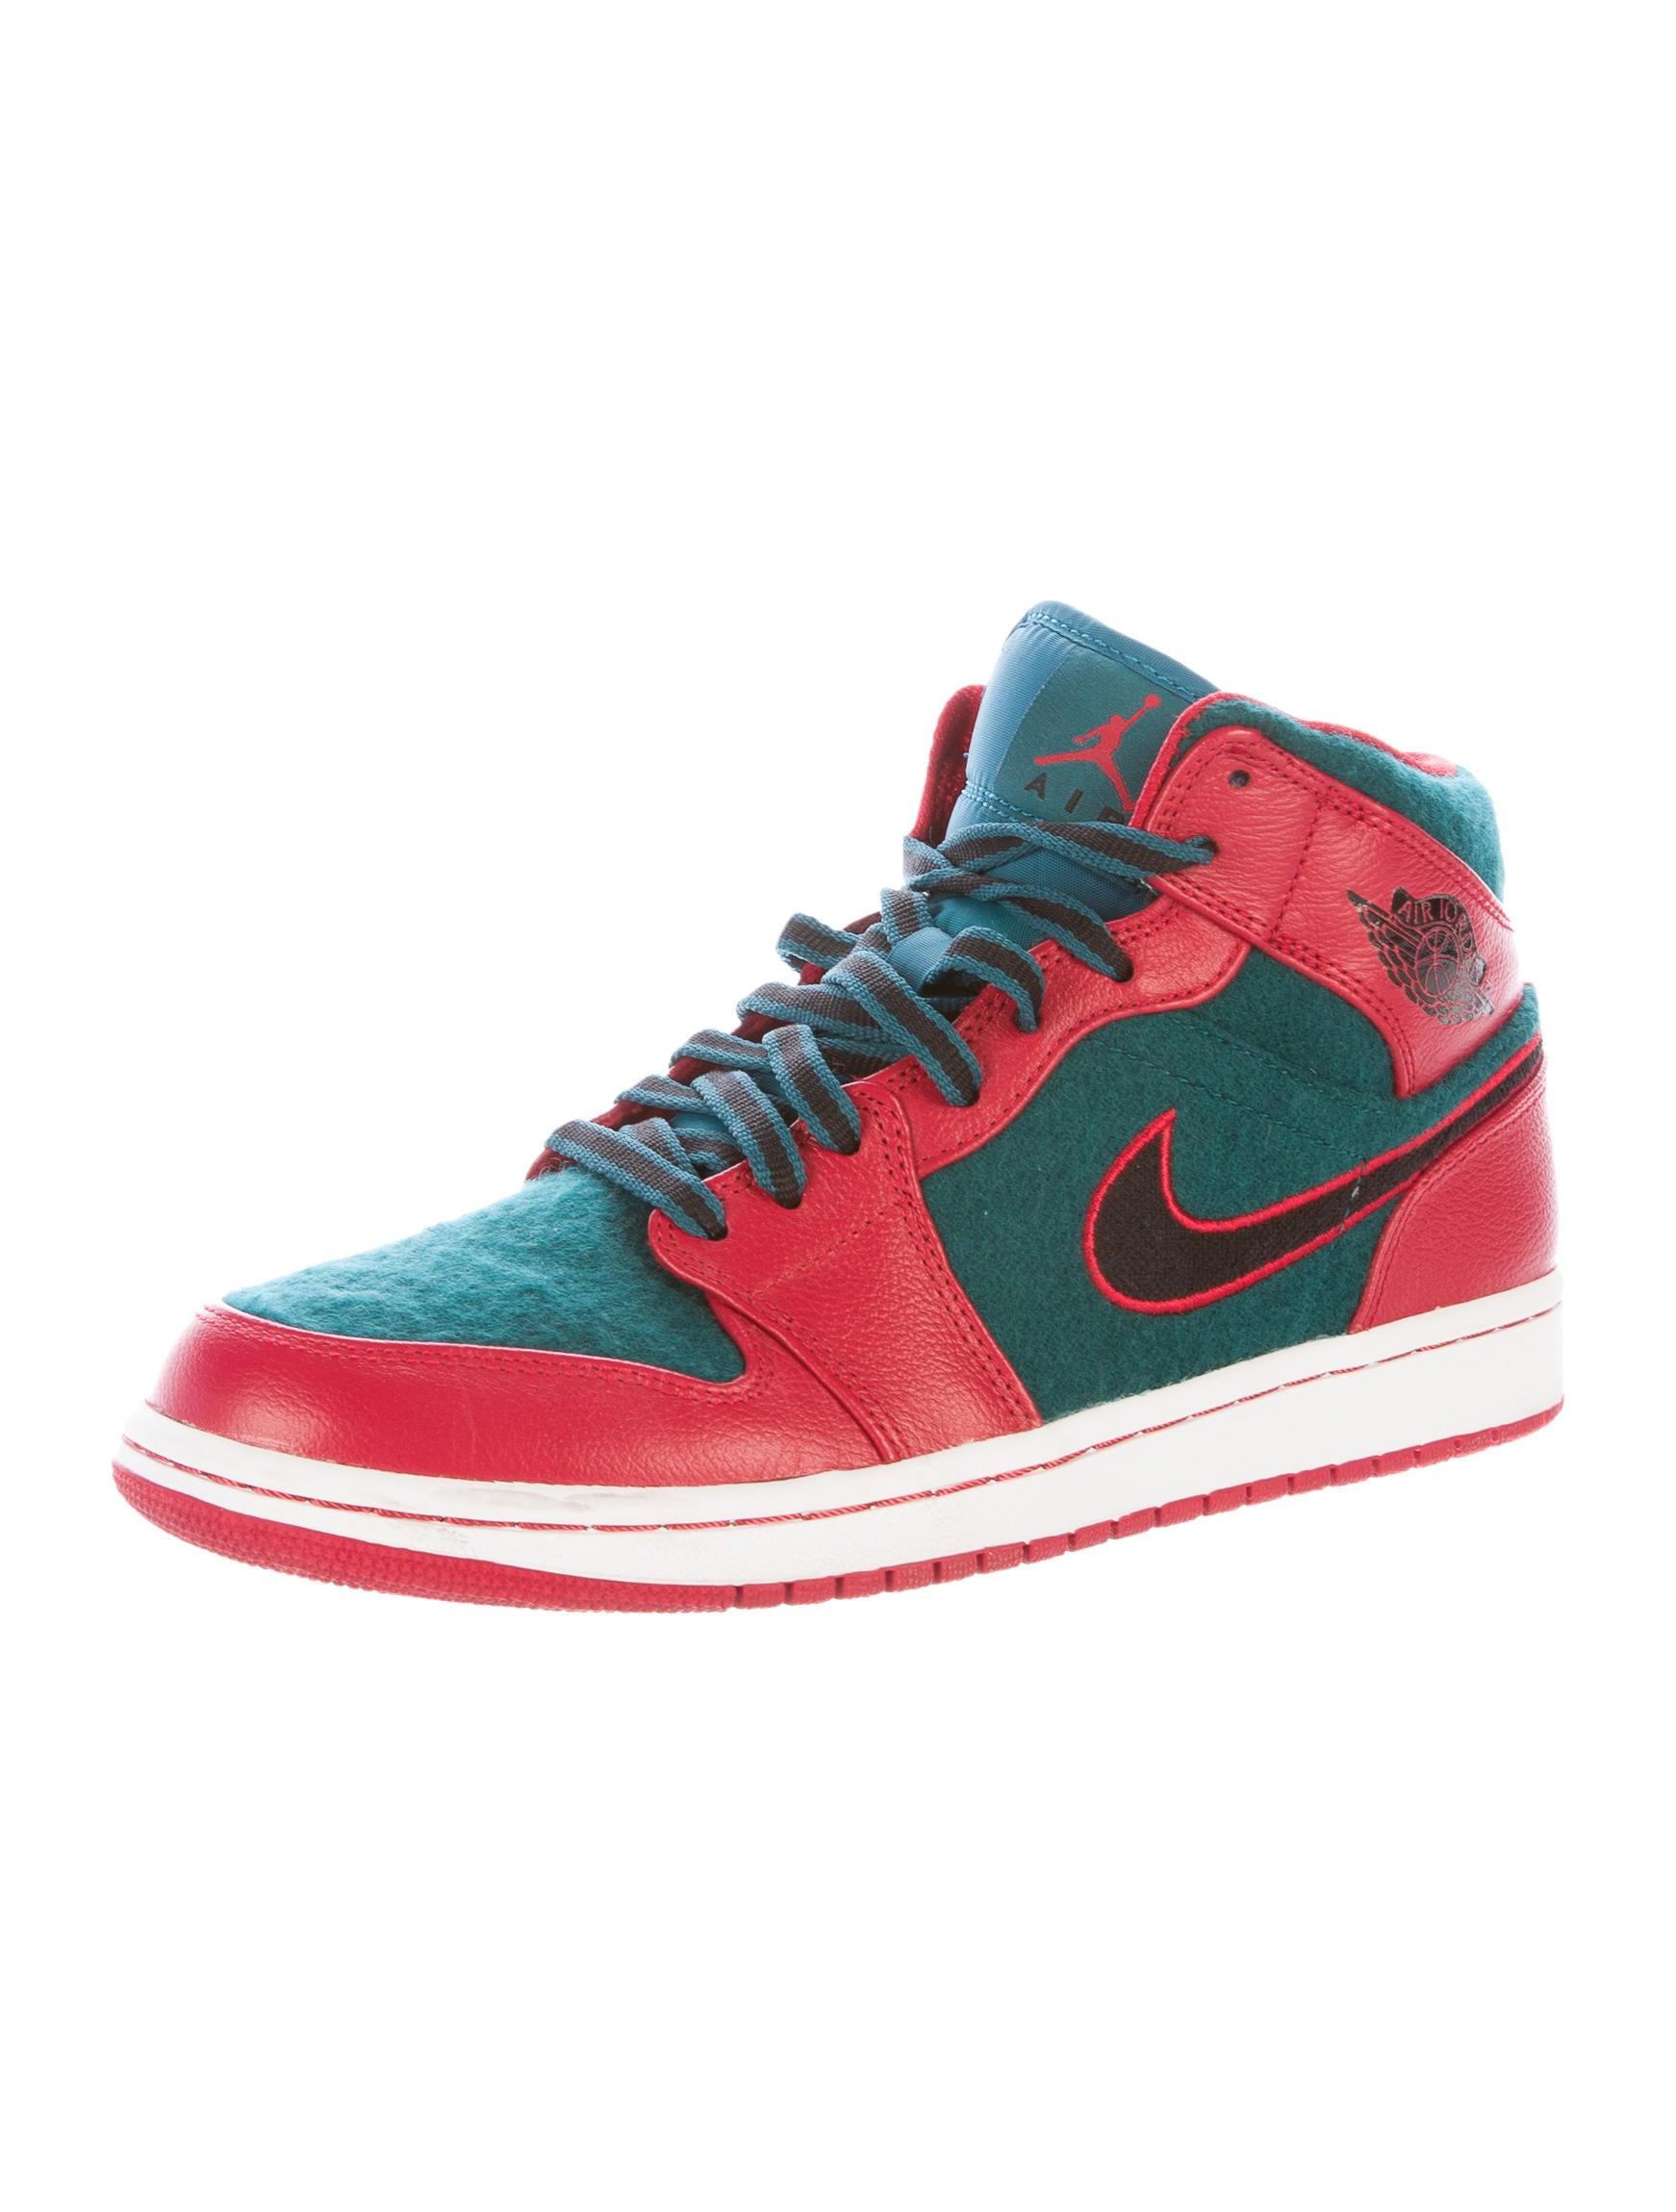 nike air jordan 1 mid top sneakers shoes wniaj20026. Black Bedroom Furniture Sets. Home Design Ideas